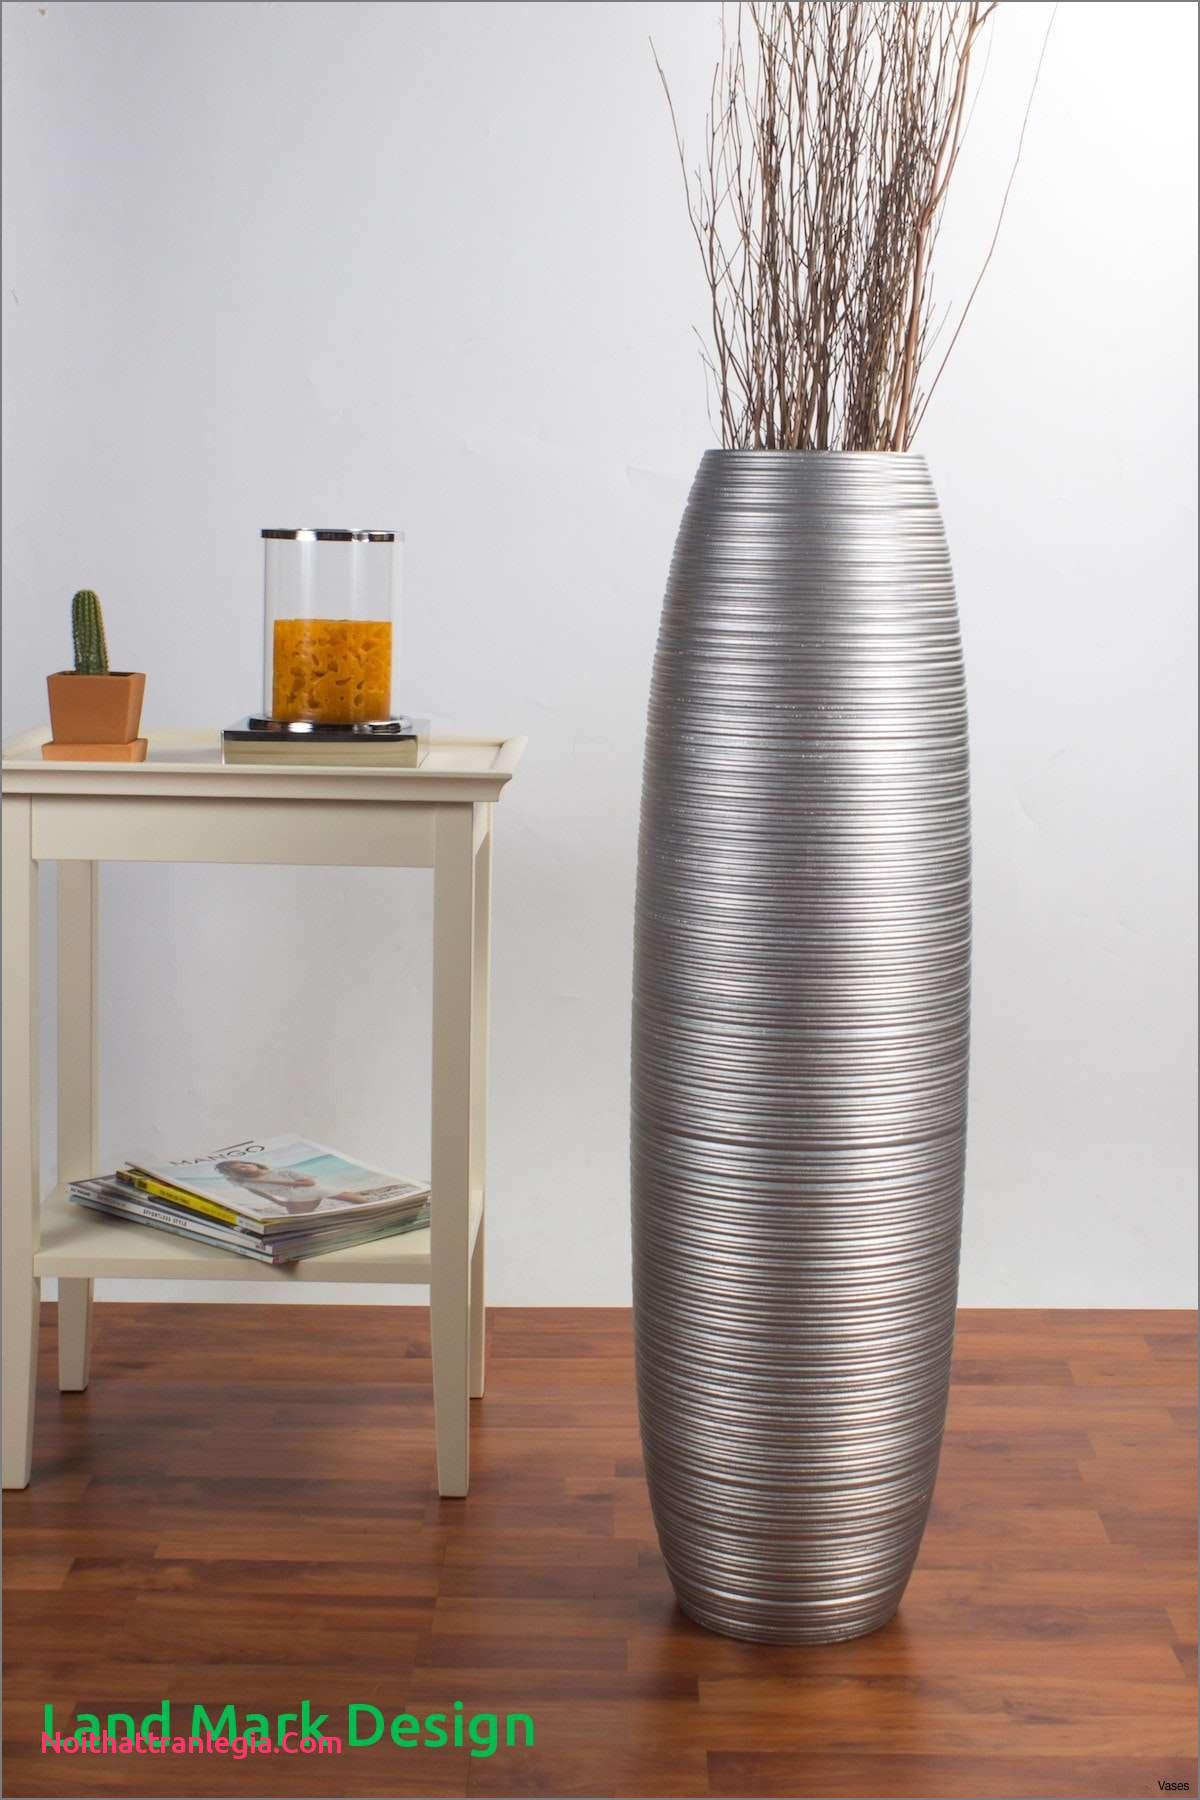 tall floor vases wholesale of 20 large floor vase nz noithattranlegia vases design with d dkbrw 5743 1h vases 36 floor vase i 0d cheap floor vase from large